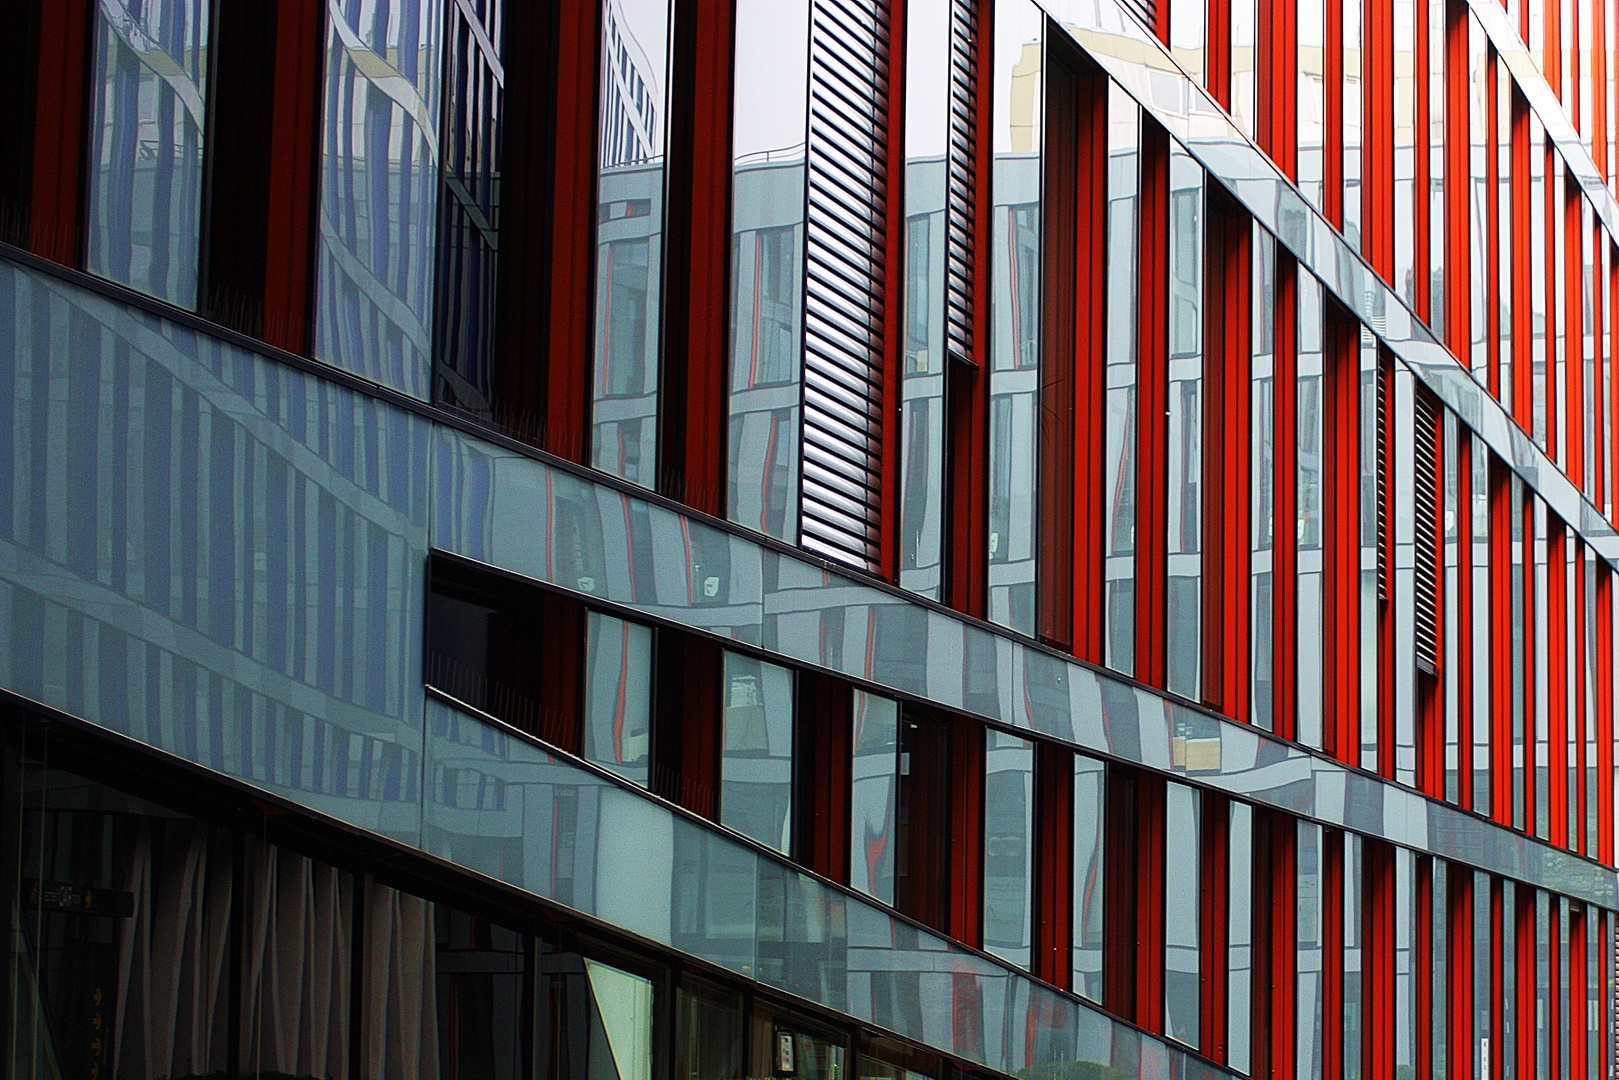 Moderne Architektur in Winterhude